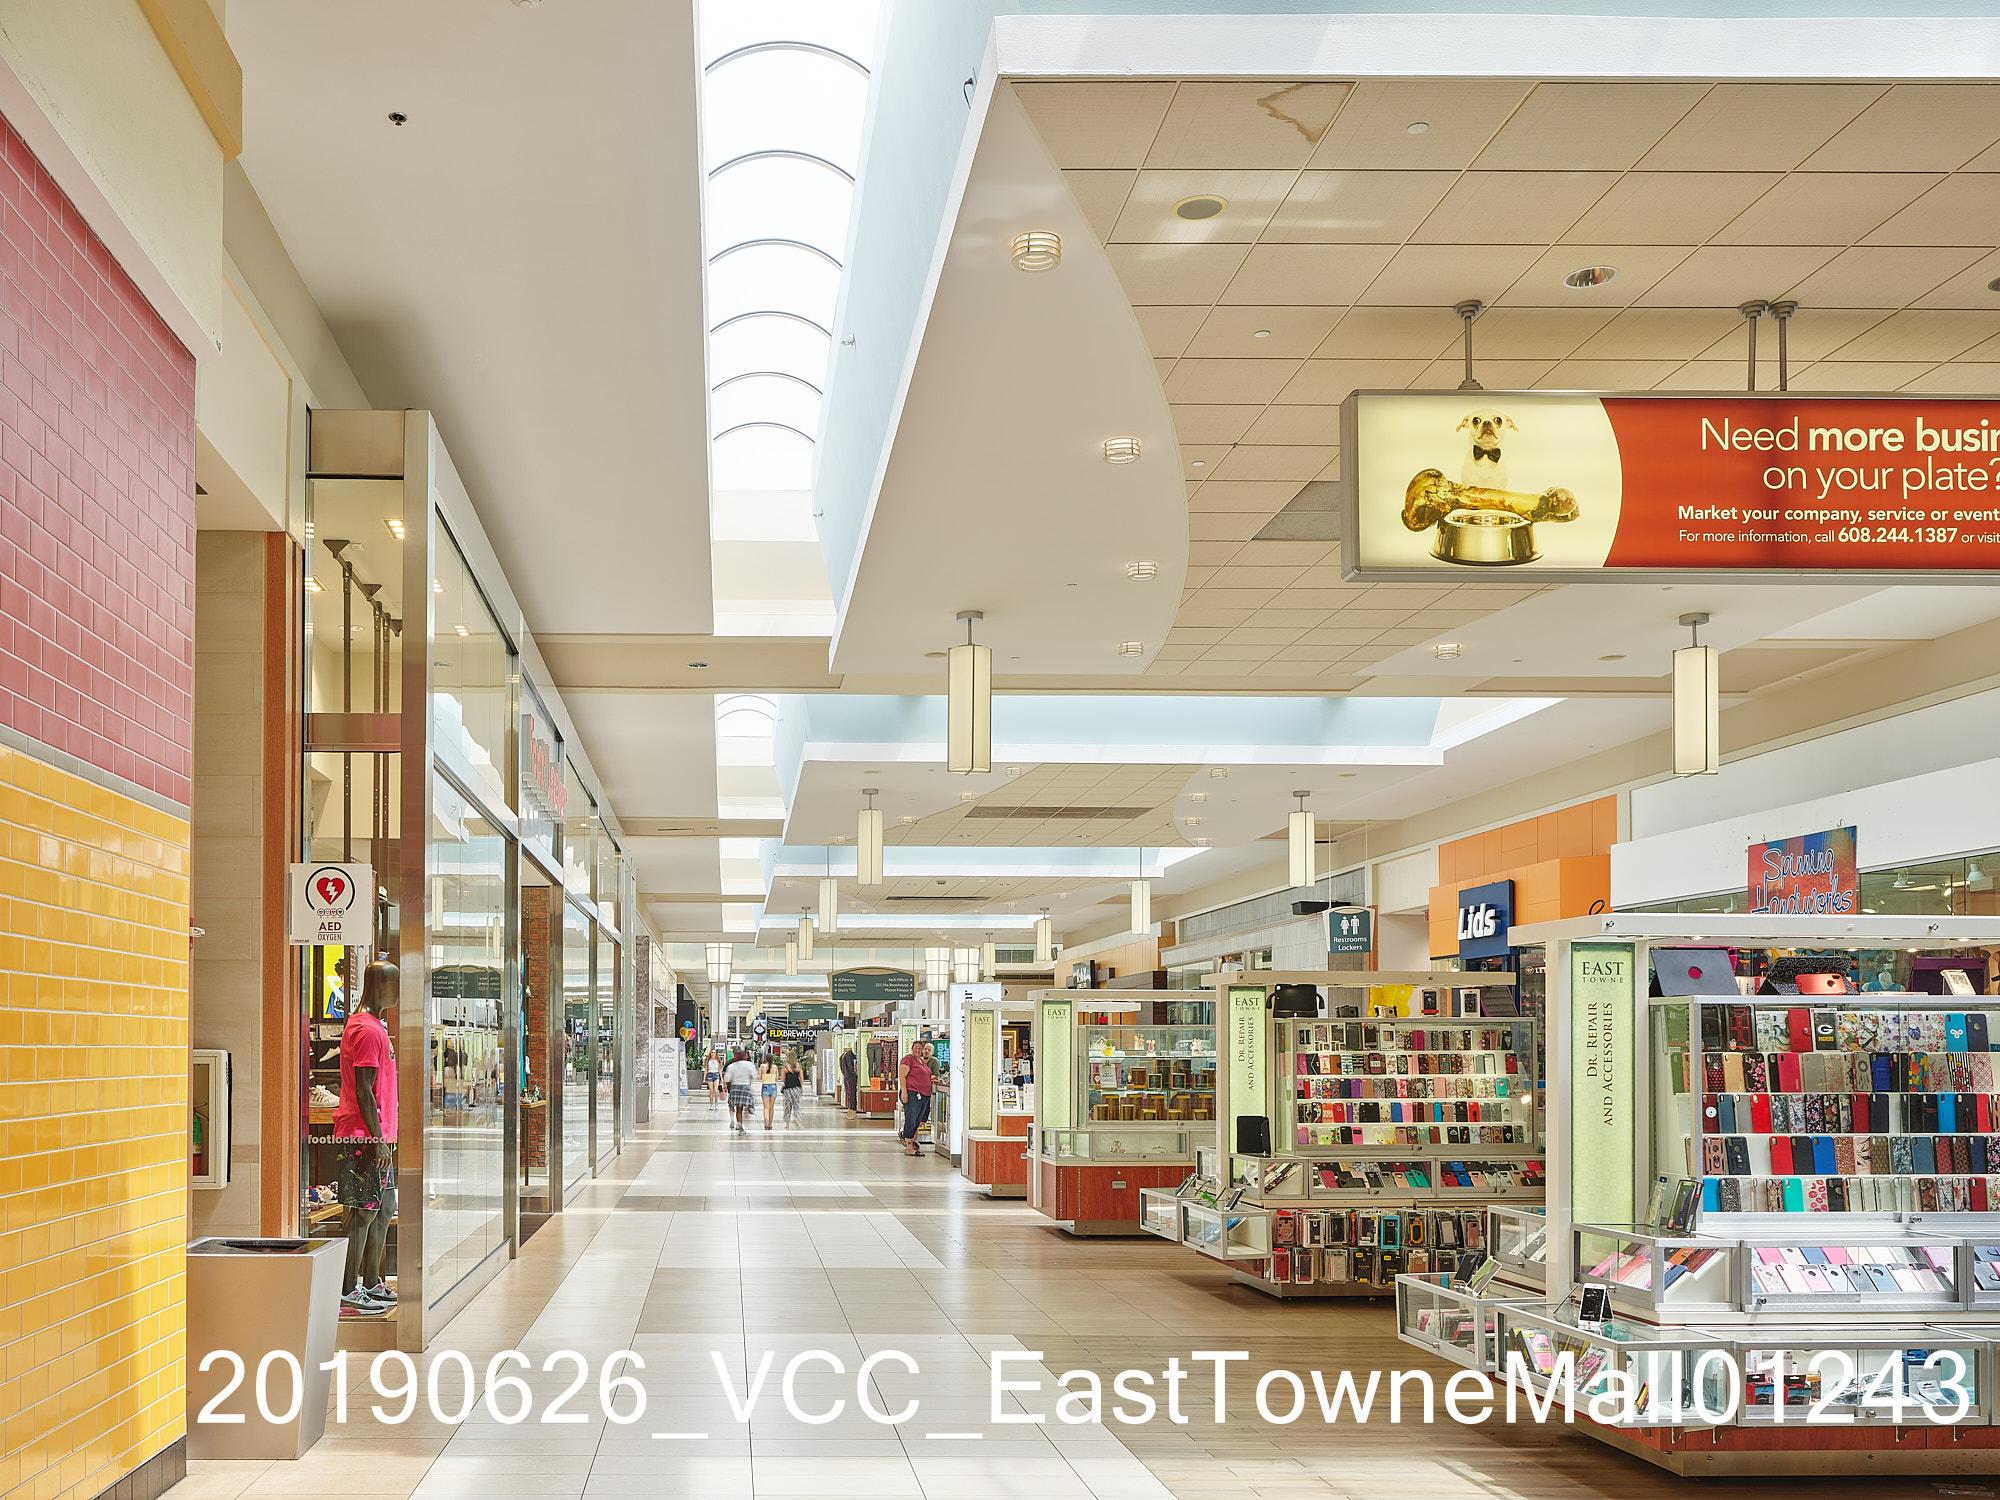 20190626_VCC_EastTowneMall01243.jpg